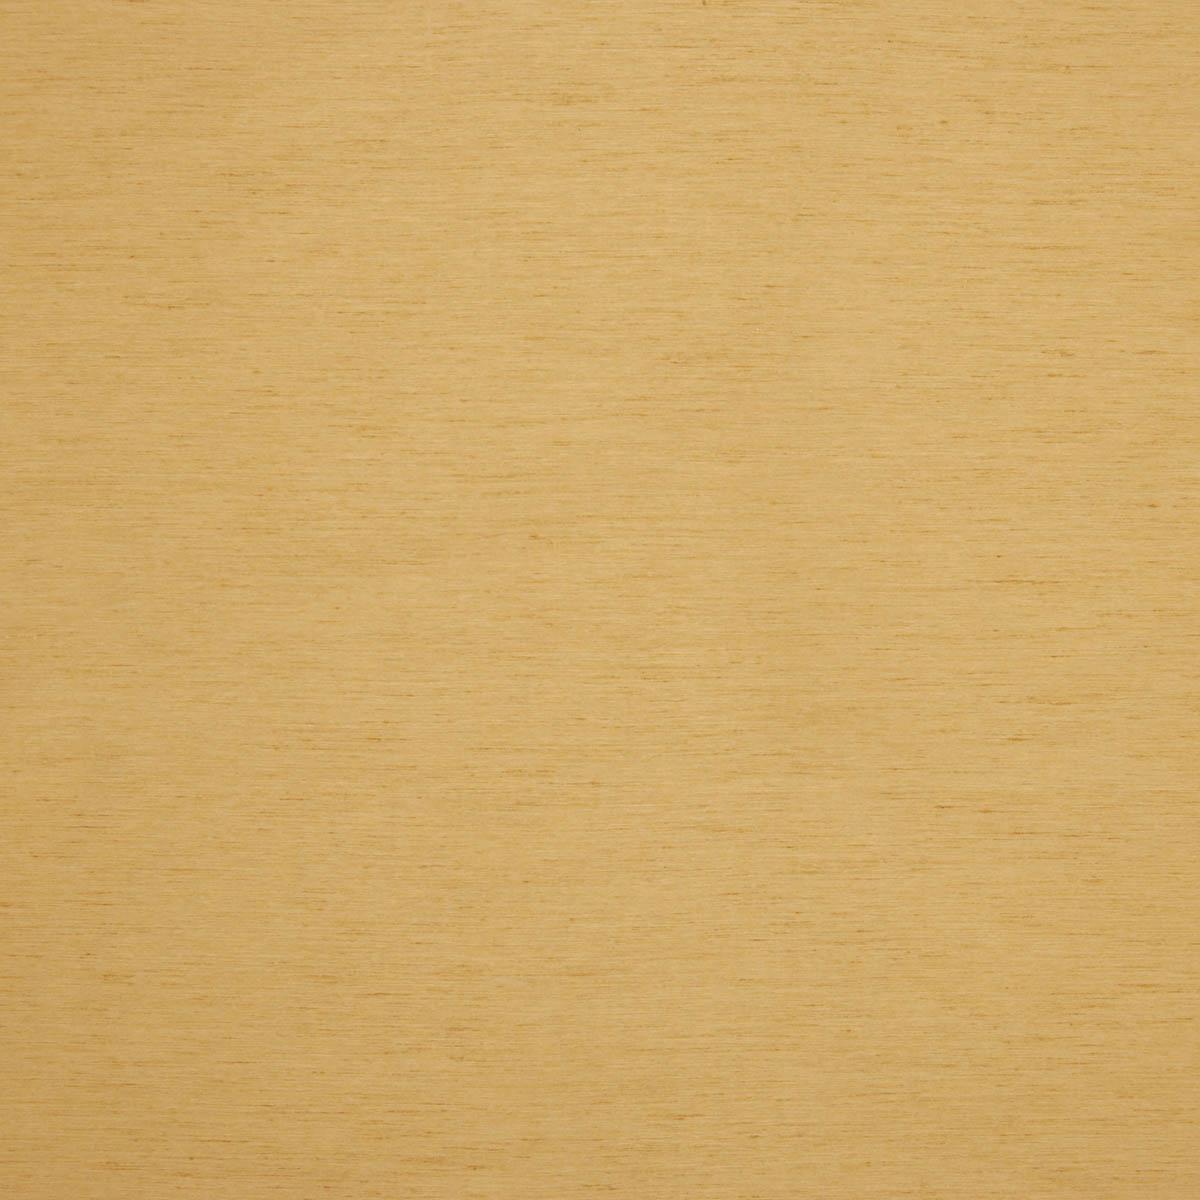 Curtains texture gold - Silky Curtain Fabric